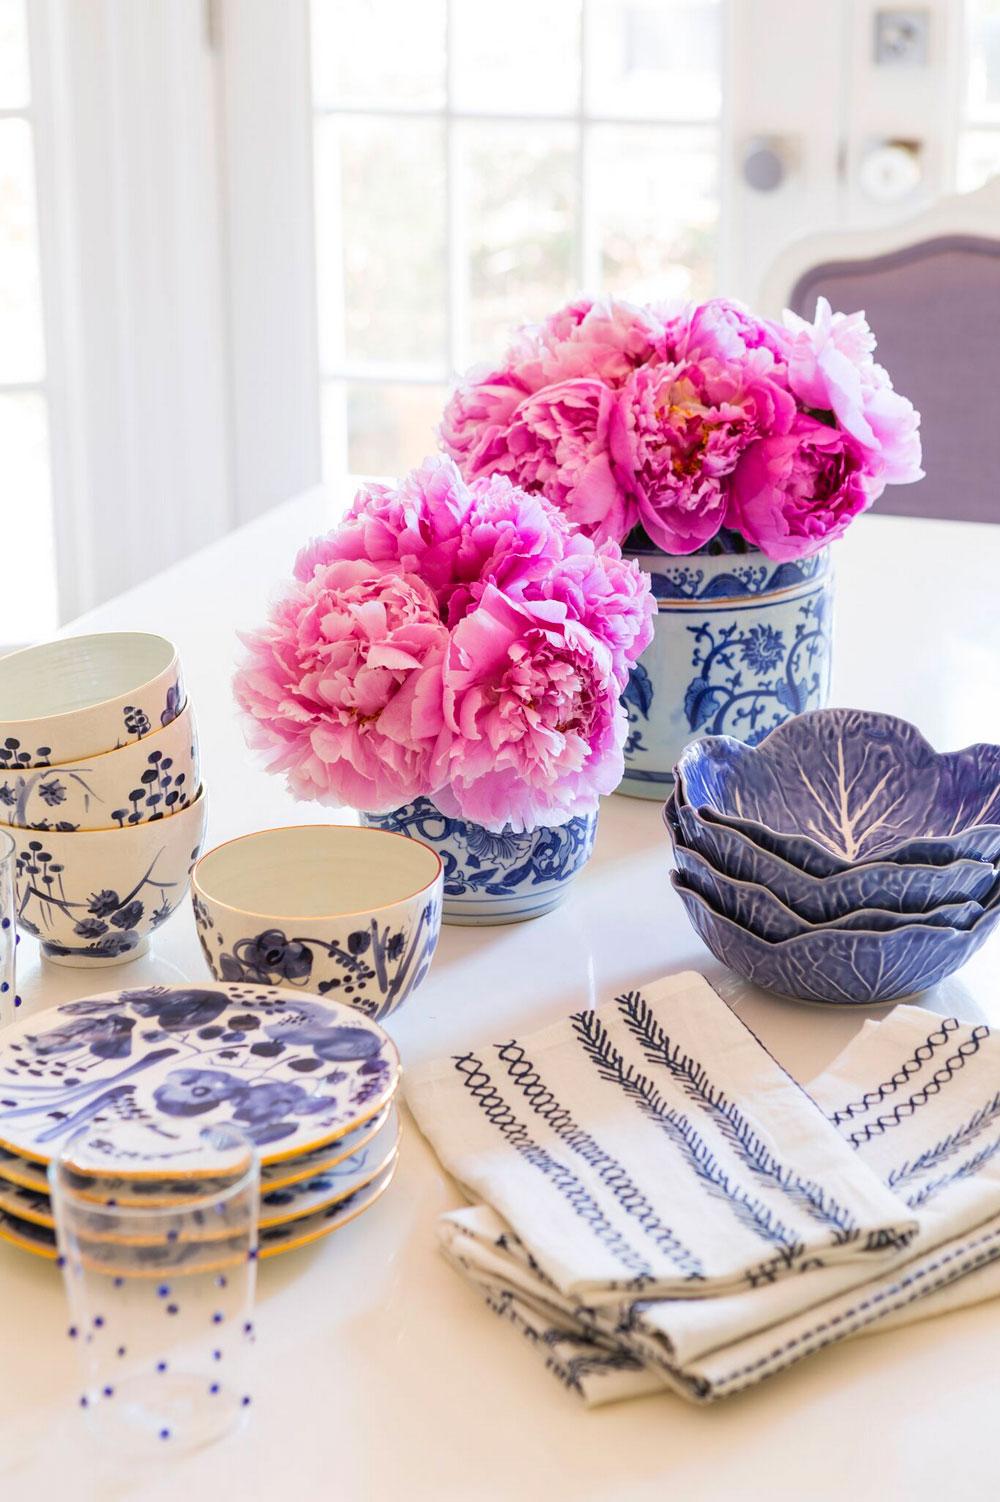 Molly-Ray-Young-Interior-Design-Little-Rock-Arkansas-Kitchen-Blue-and-White-Ceramic-Pottery-Spode-Rett-Peek.jpg